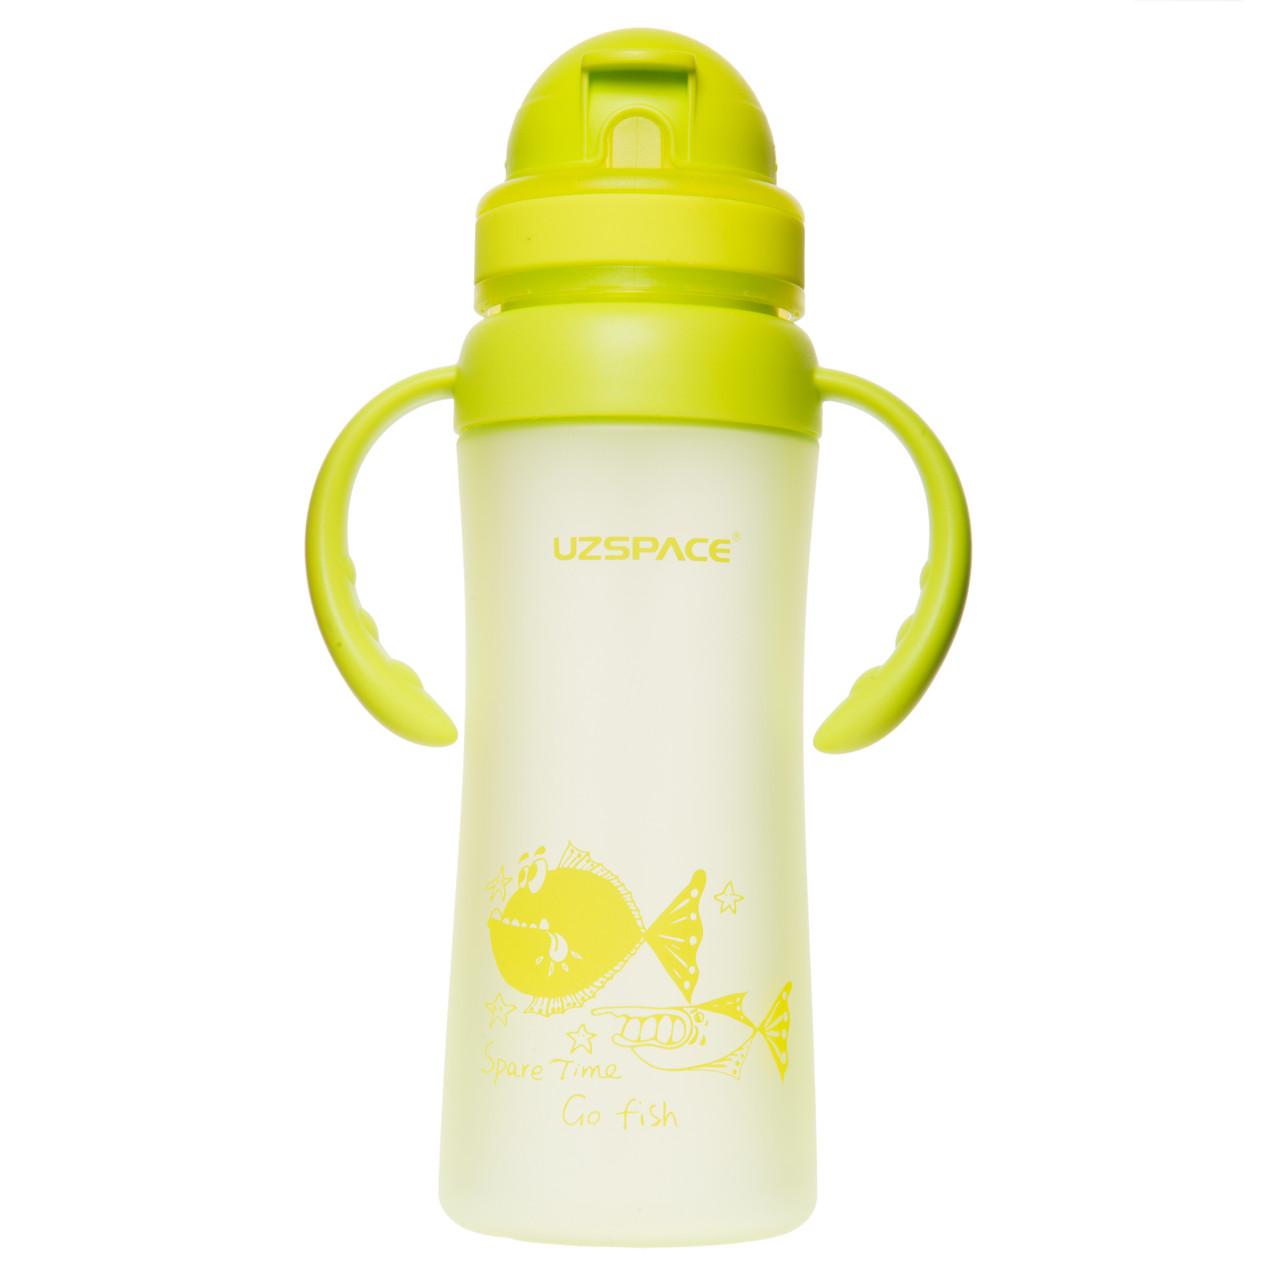 Дитяча пляшка для води 350 мл Uzspace Go Flash салатова (серія 3041)